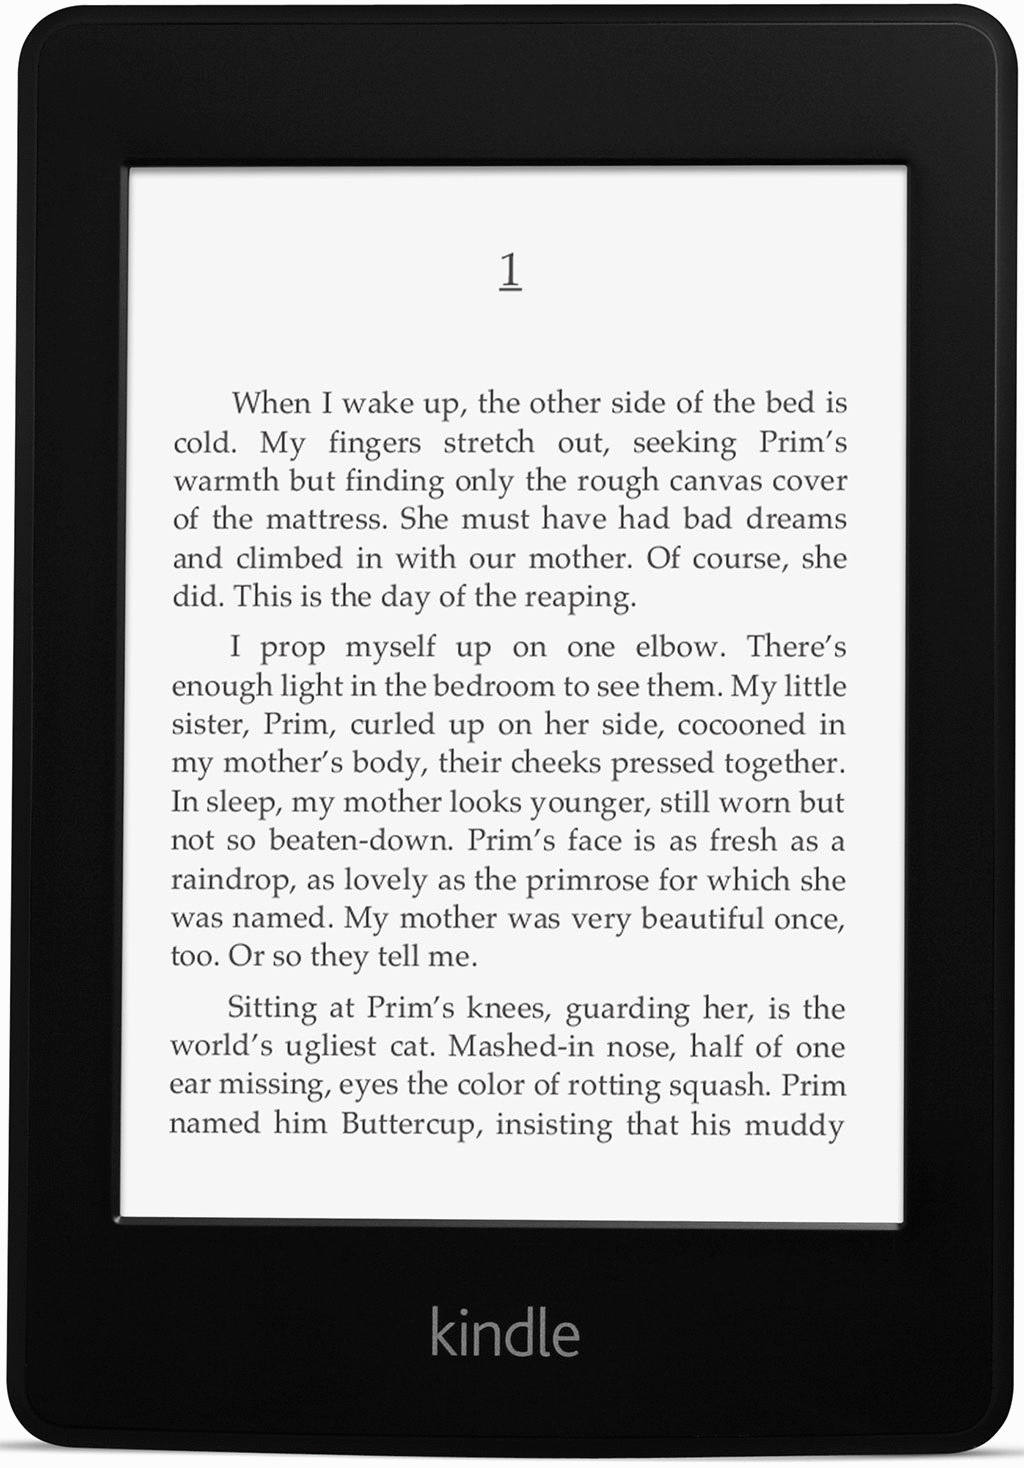 Amazon Kindle Paperwhite 6 2GB [Wi-Fi + 3G, 2. Generation] schwarz